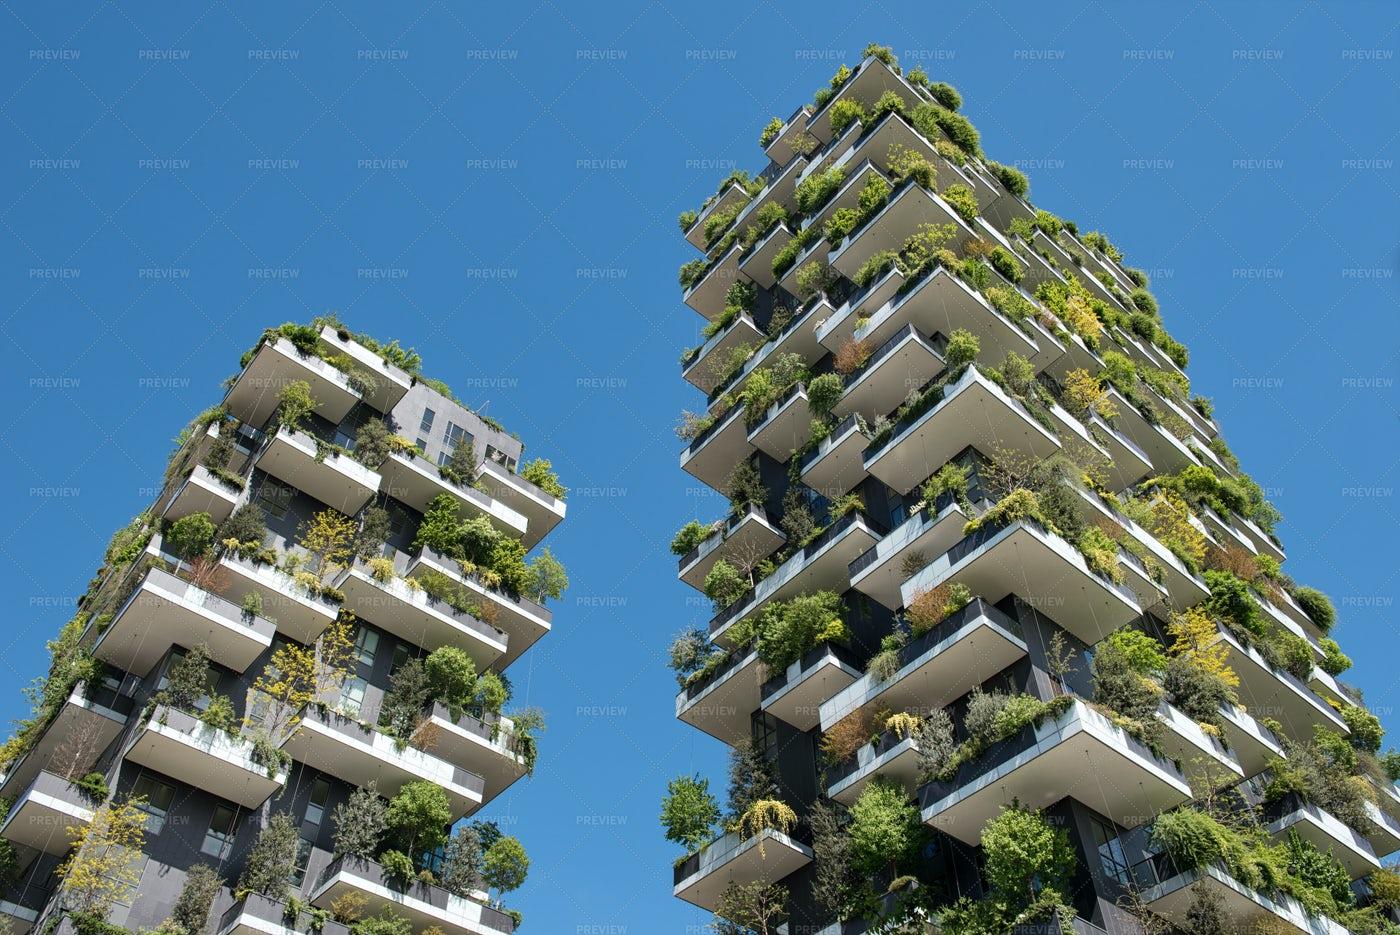 Tree Skyscrapers Of Milan, Italy: Stock Photos